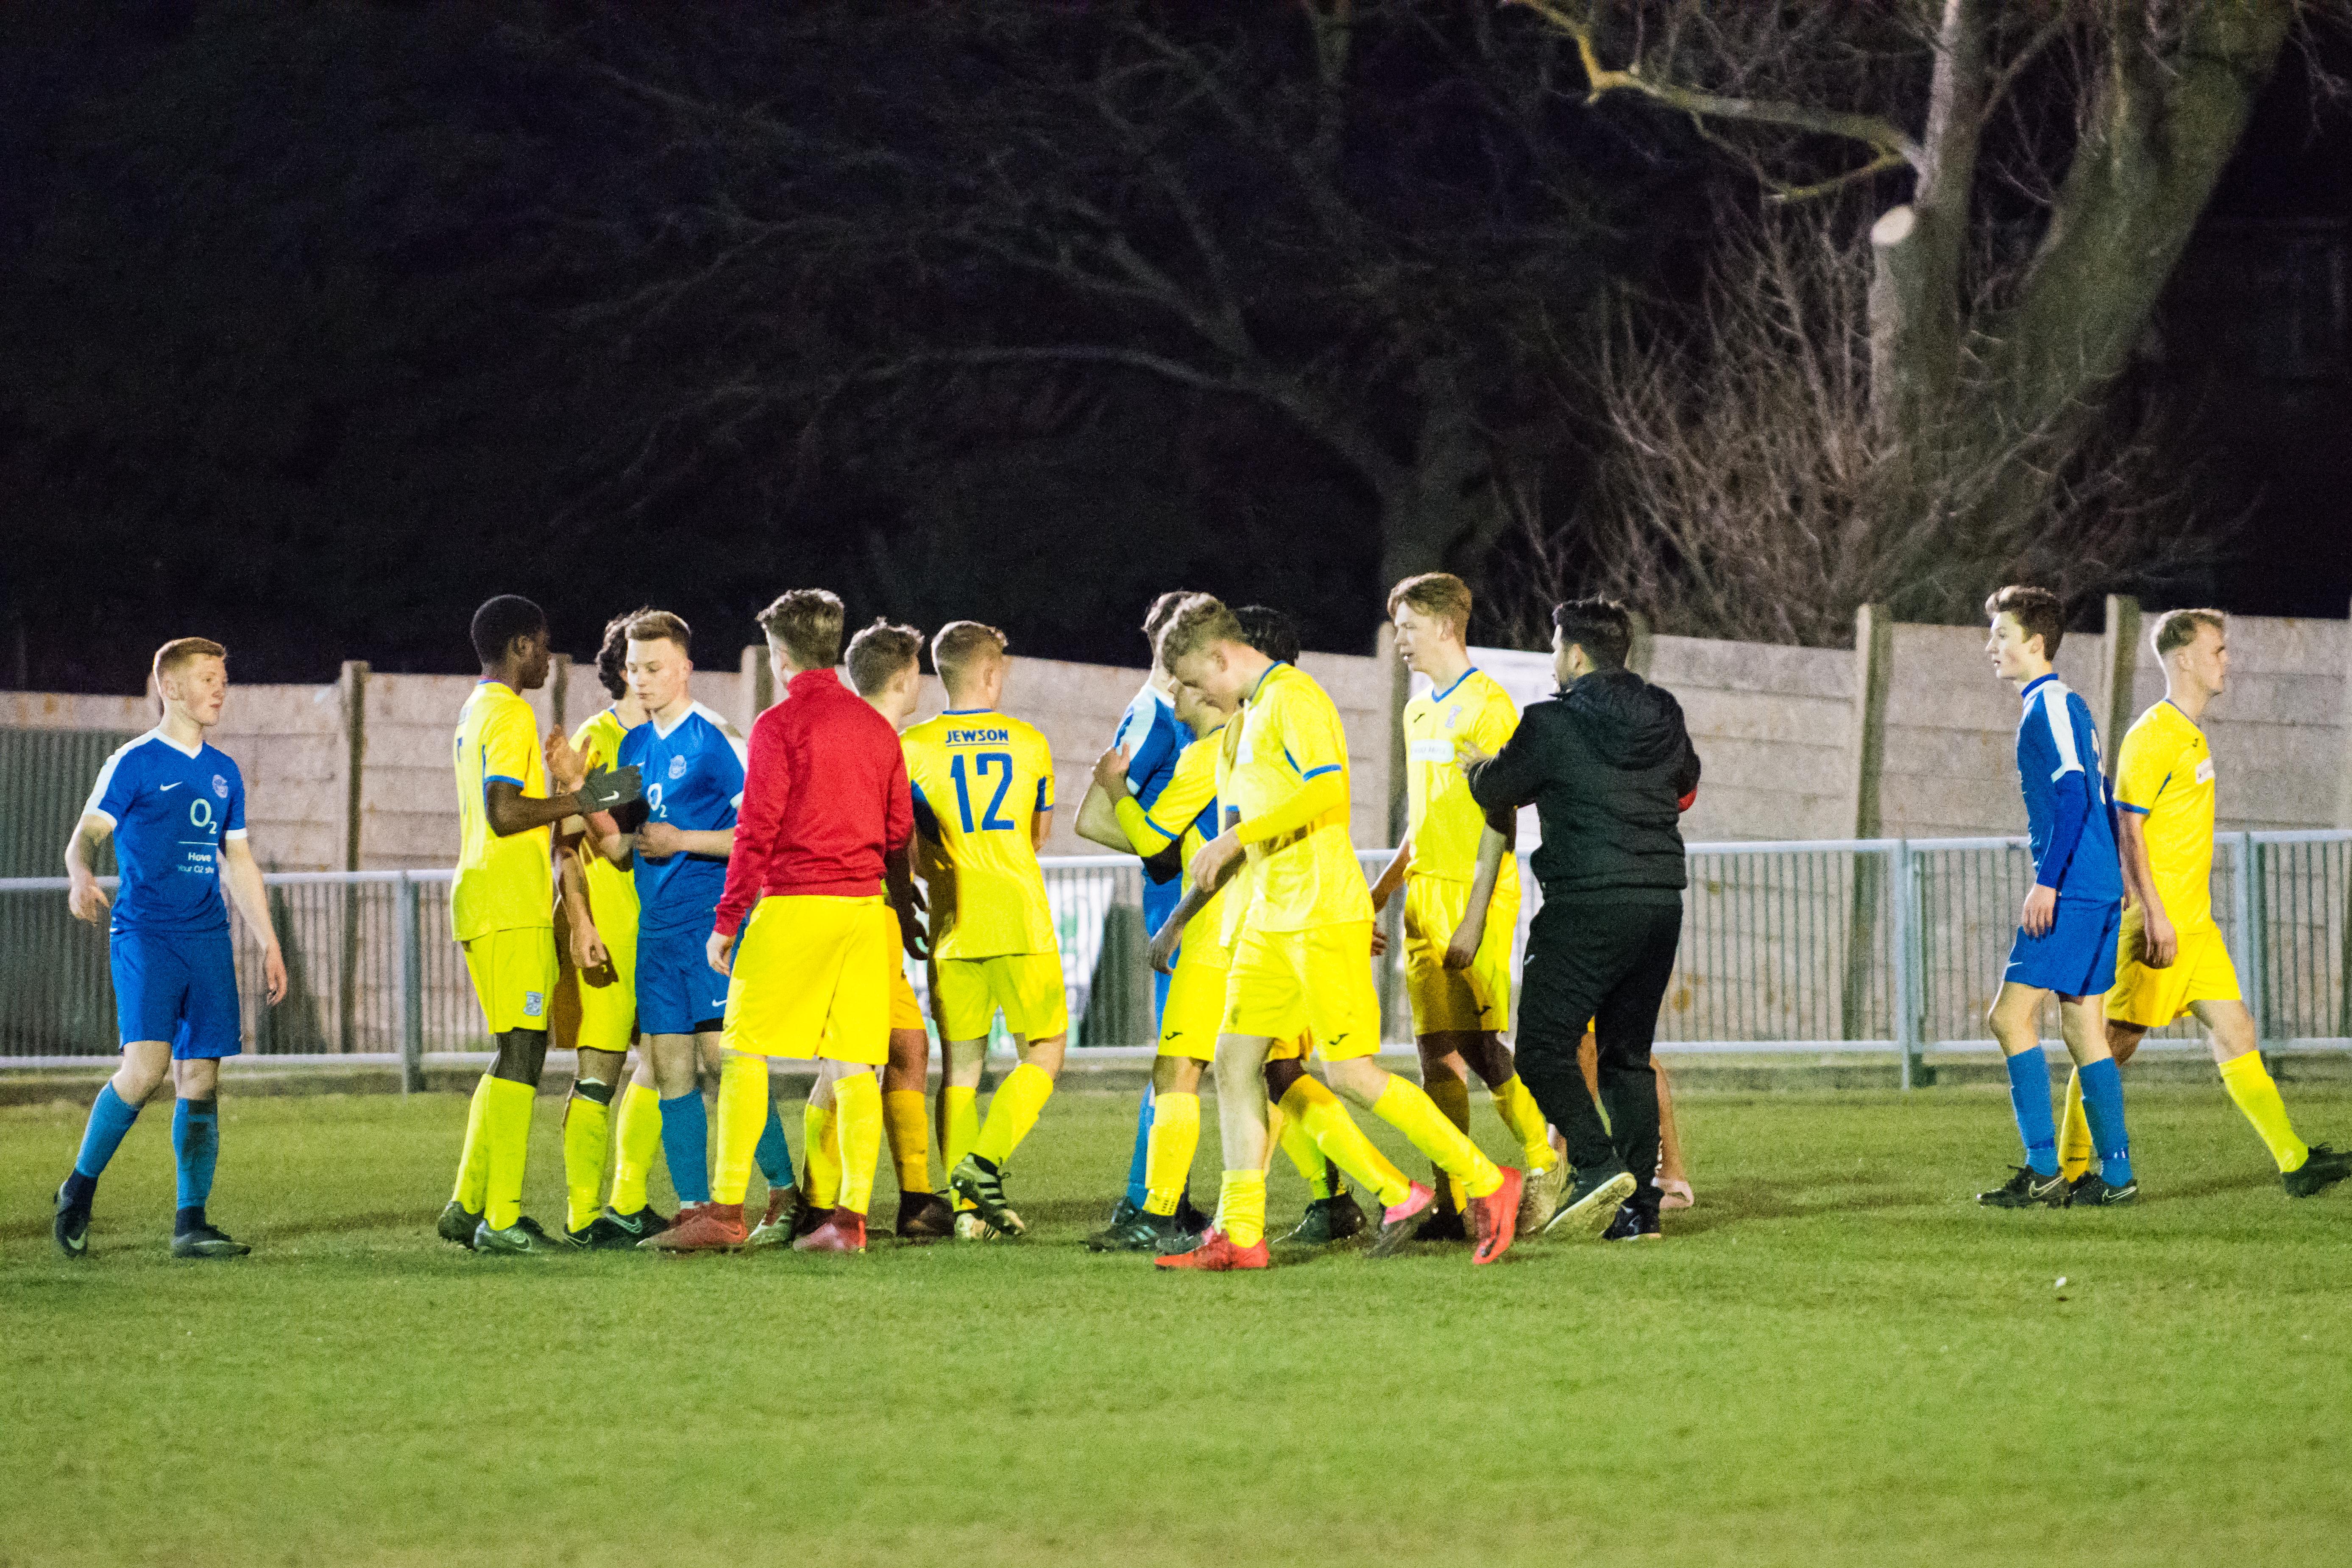 DAVID_JEFFERY Shoreham FC U18s vs Woking FC Academy 22.03.18 97